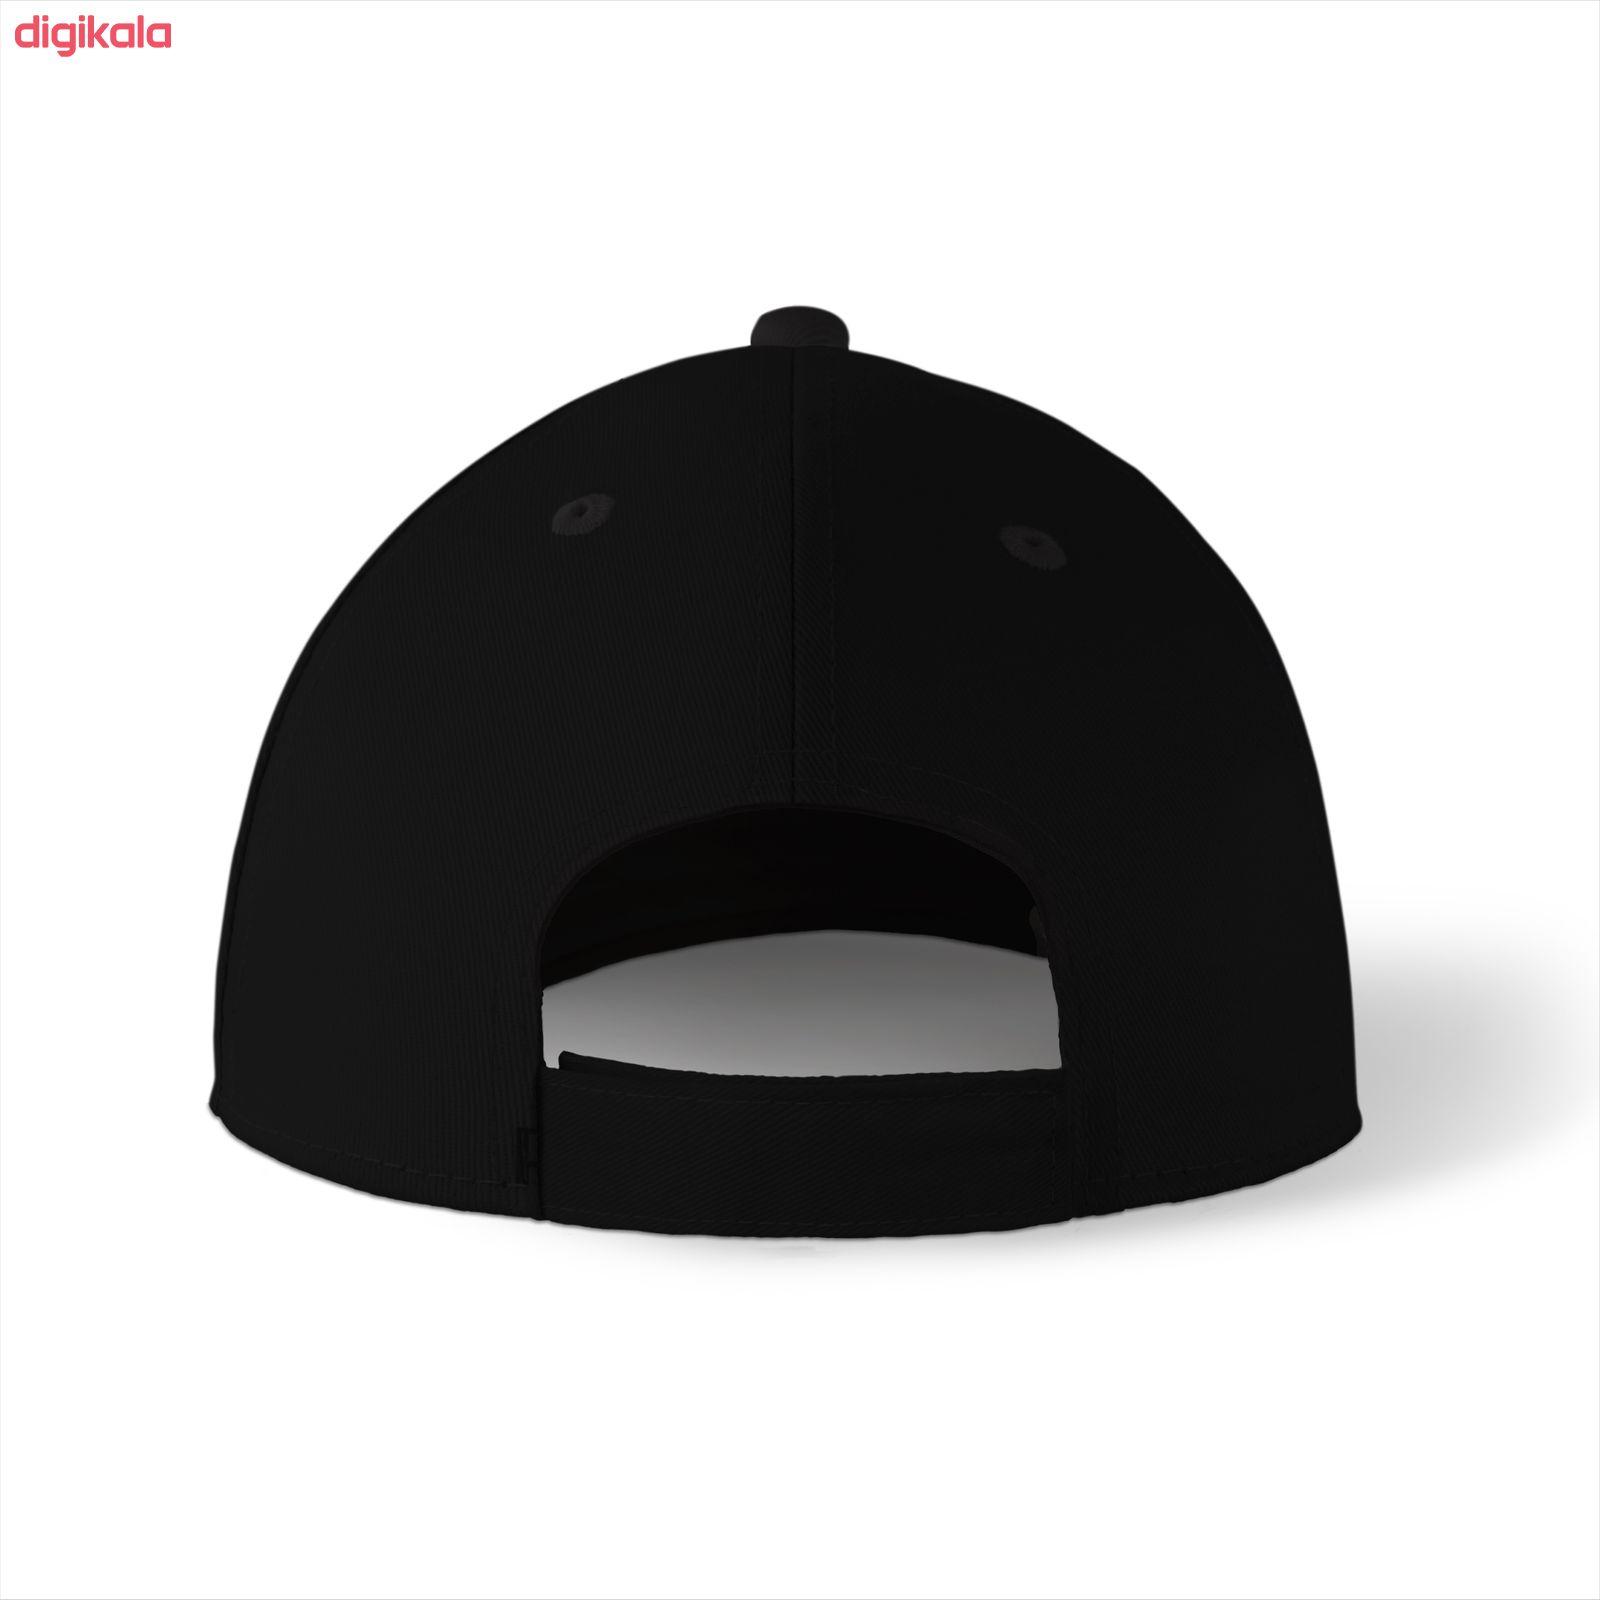 کلاه کپ مدل لیورپول main 1 1